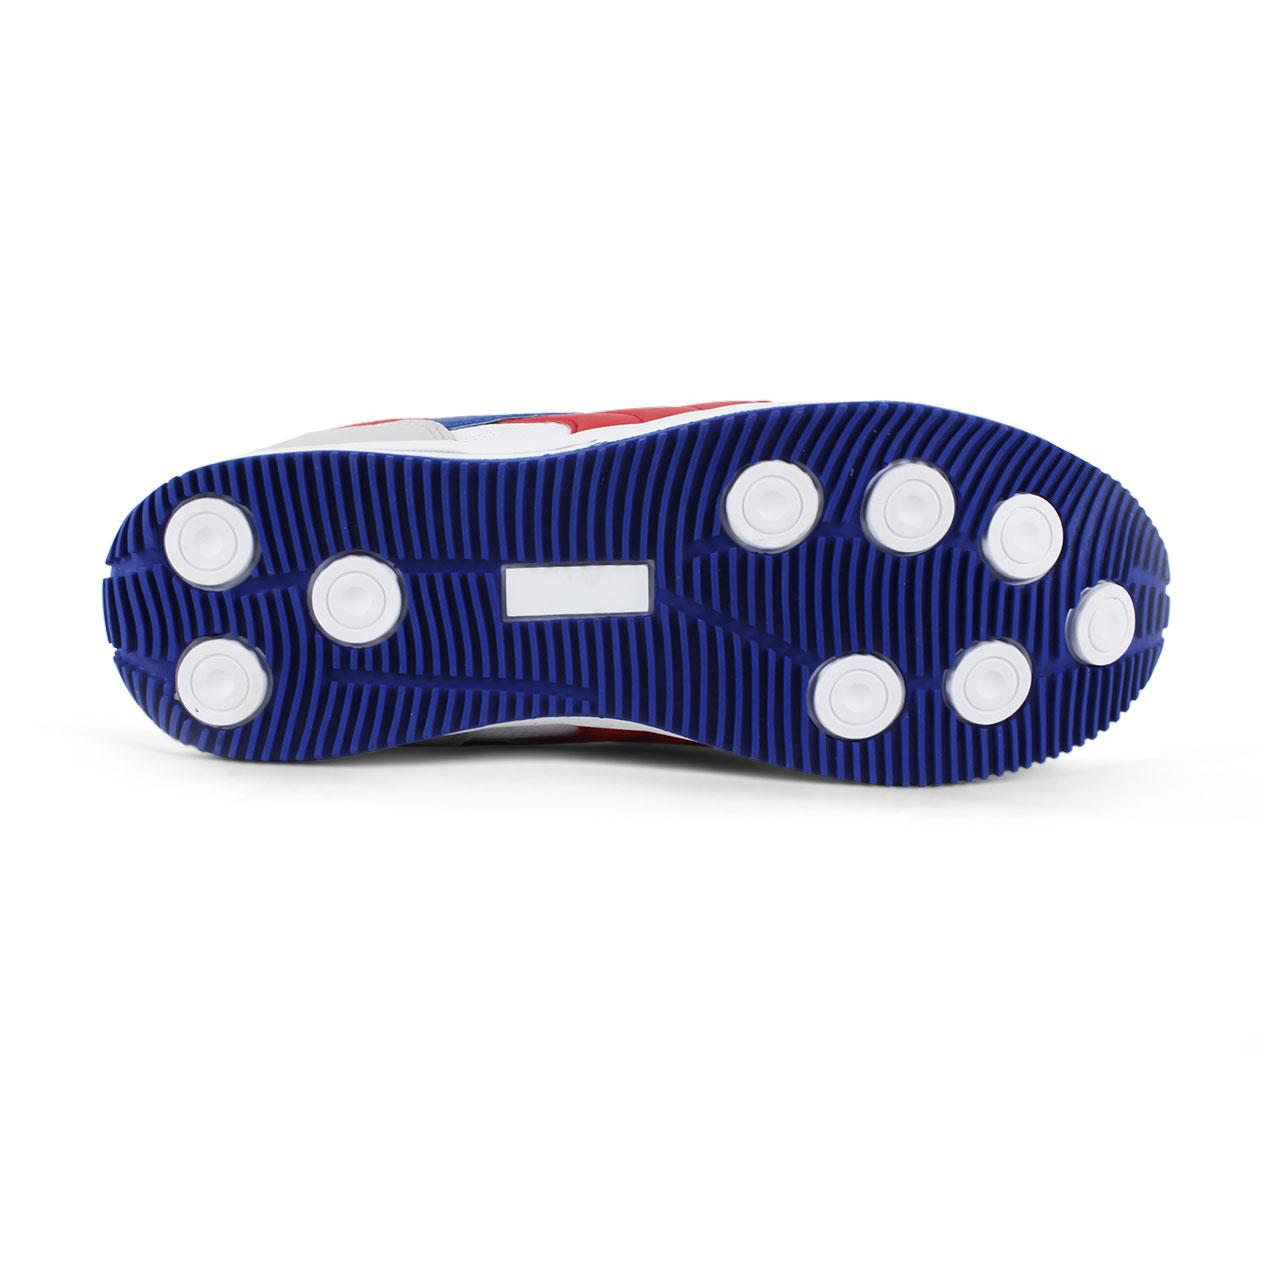 Men's Athletic Comfort Leatherette Shoes - White